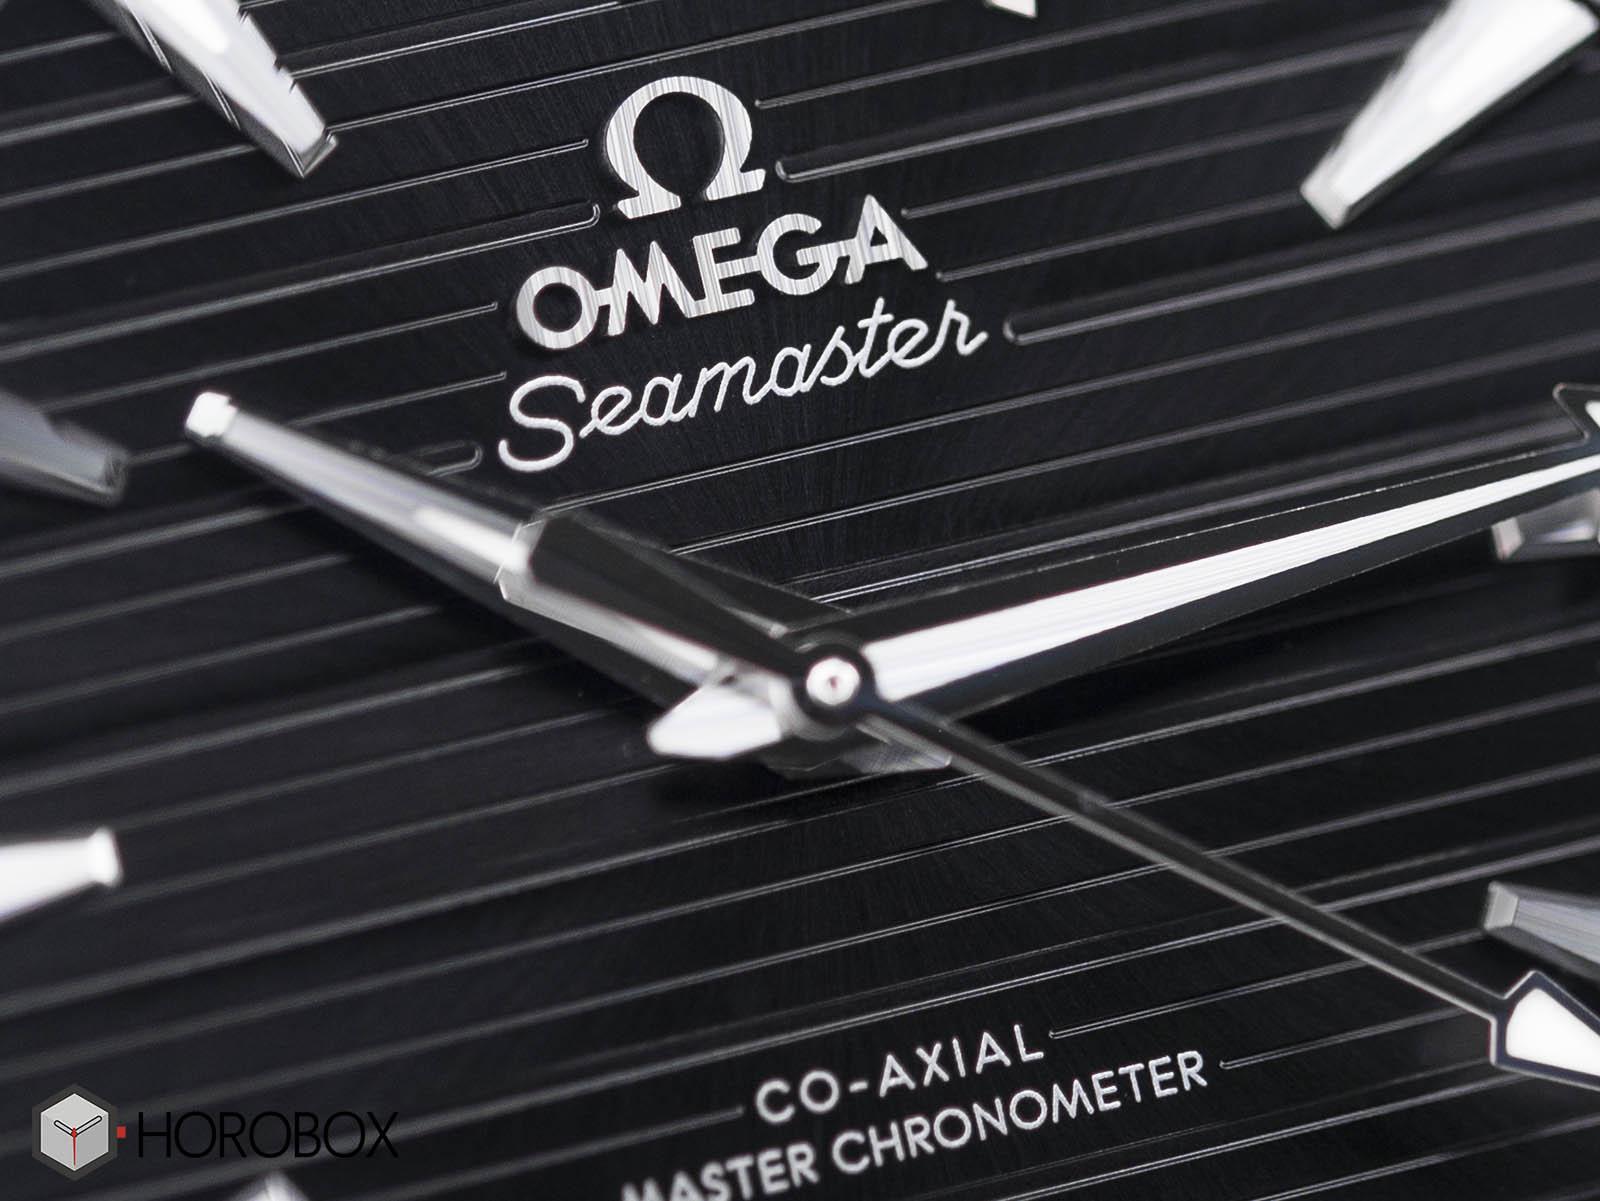 omega-seamaster-aqua-terra-150m-220-10-41-21-01-001-2-.jpg